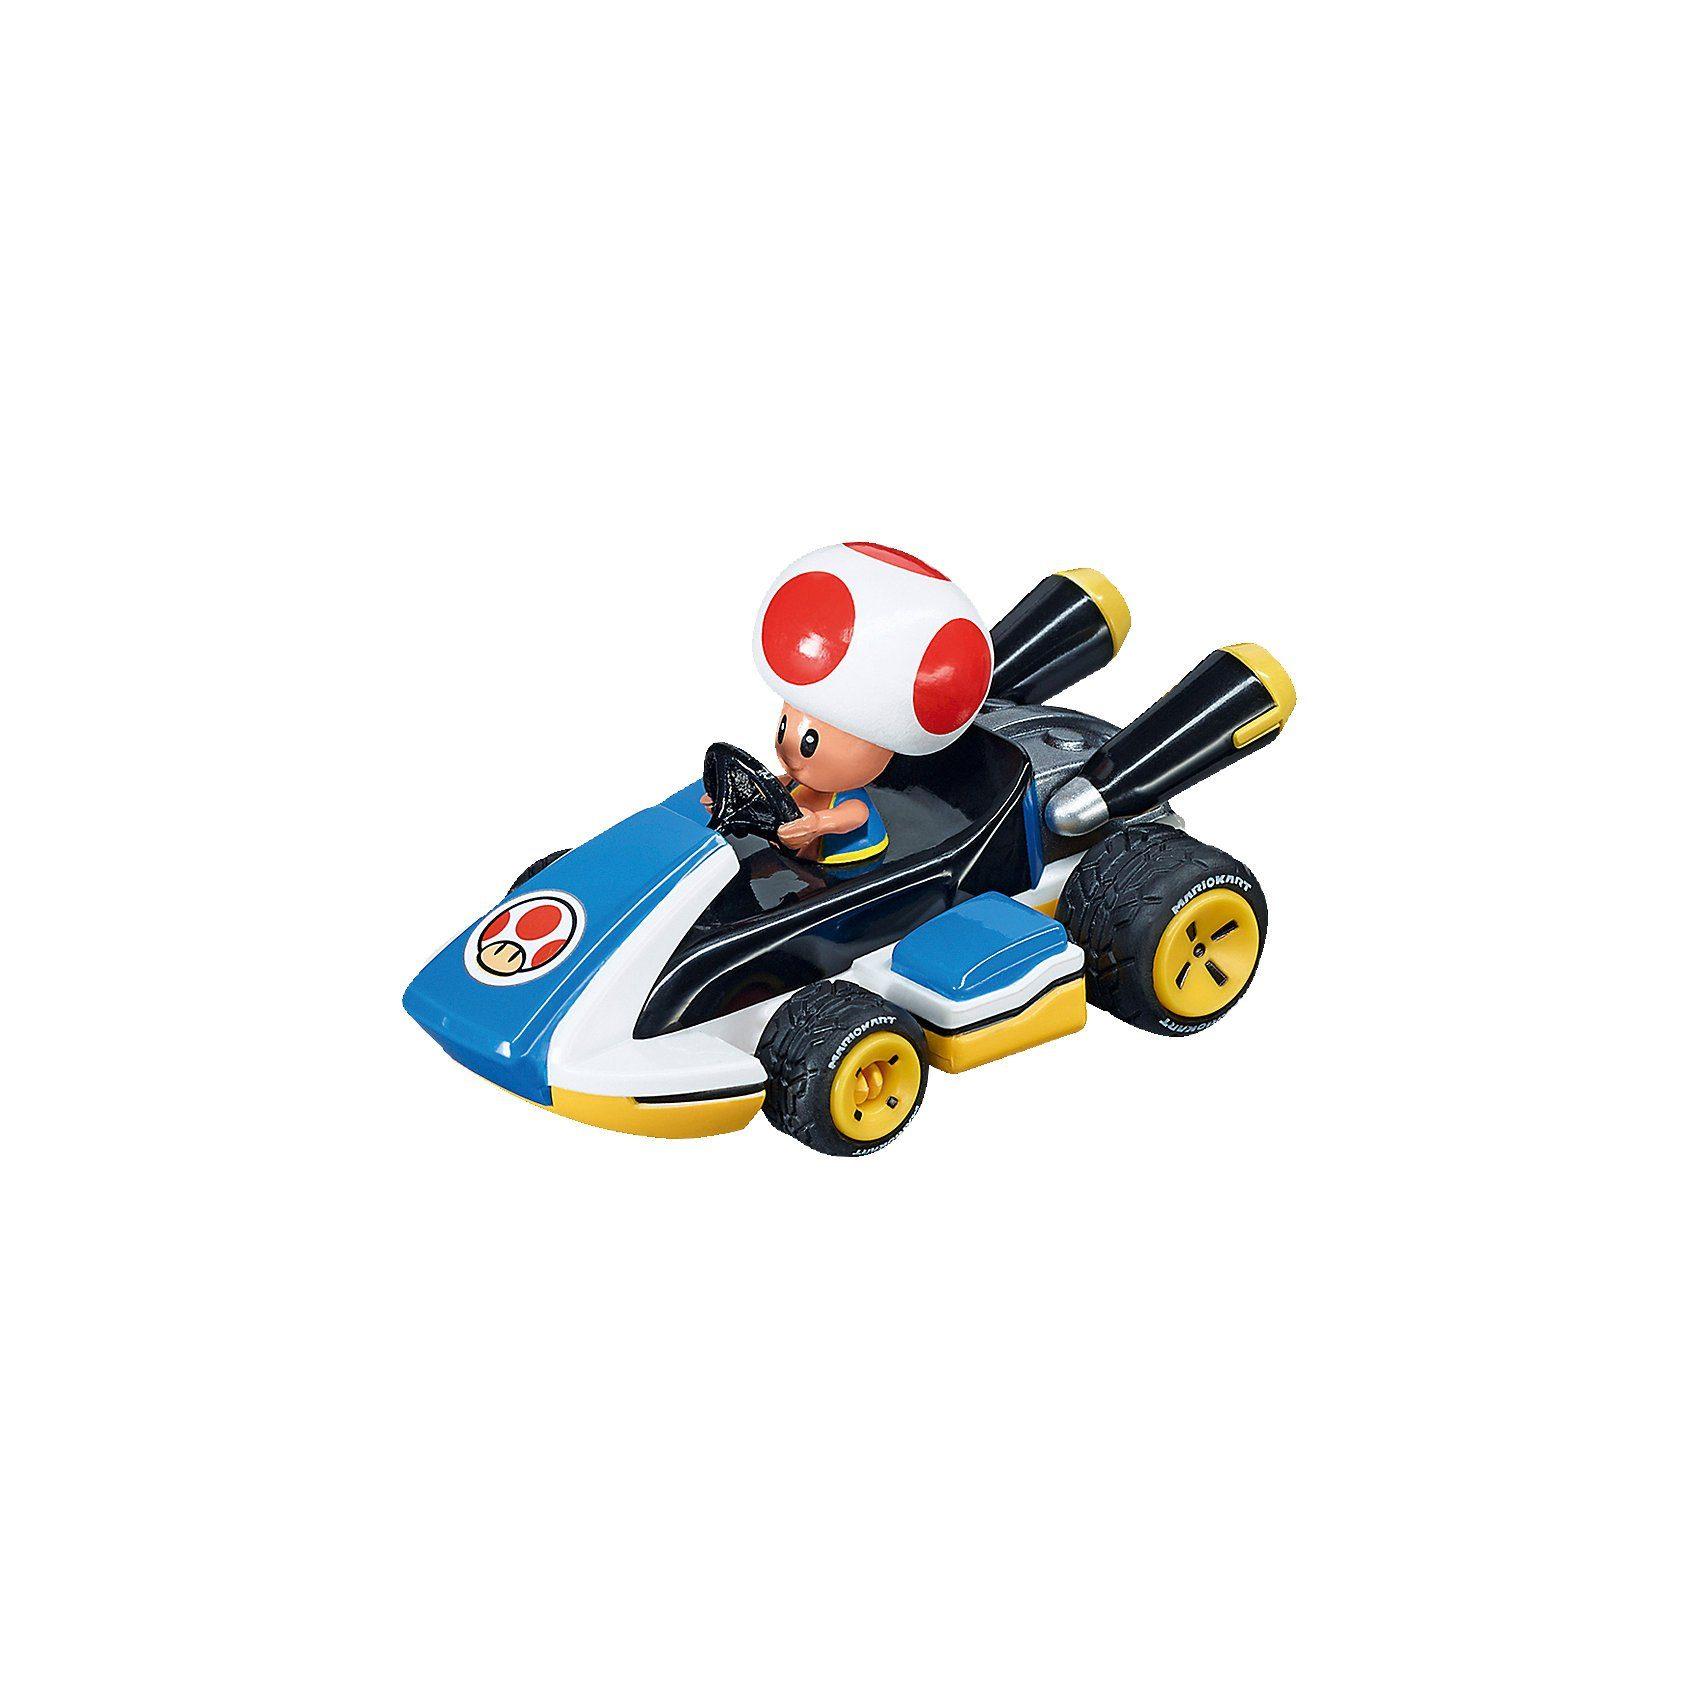 Carrera GO!!! 64036 Nintendo Mario Kart™ 8 - Toad